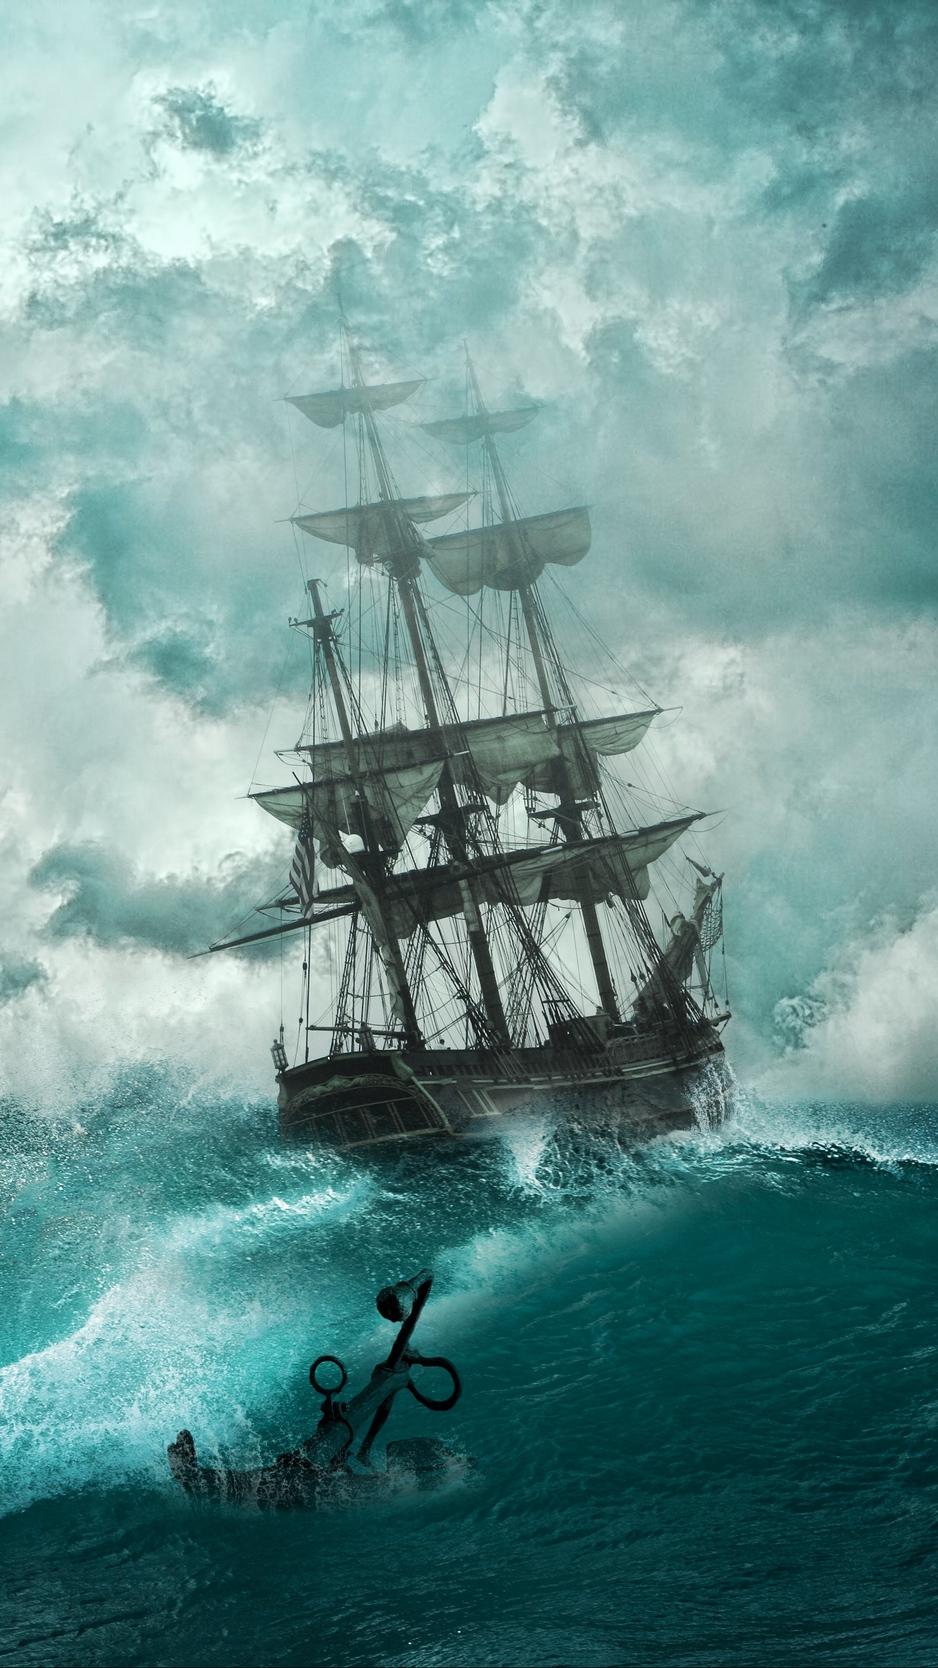 Pirate Ship Storm : pirate, storm, Wallpaper, Ship,, Storm,, Waves,, Anchor,, Photoshop, Pirate, 938x1668, Teahub.io